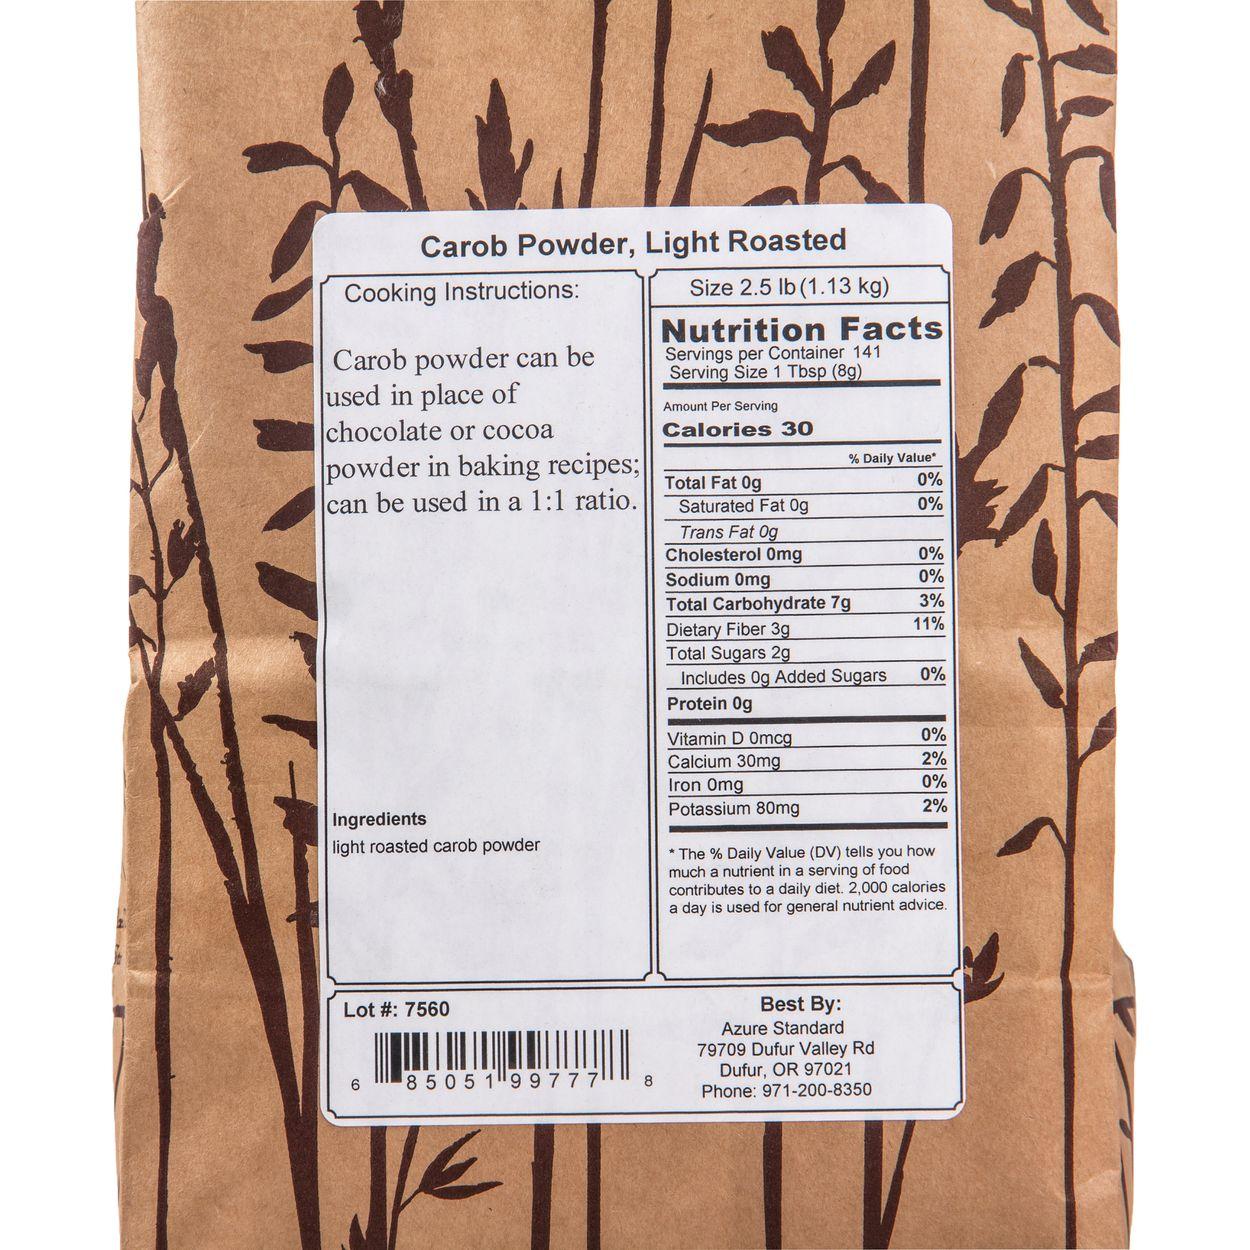 Carob Powder, Light Roasted